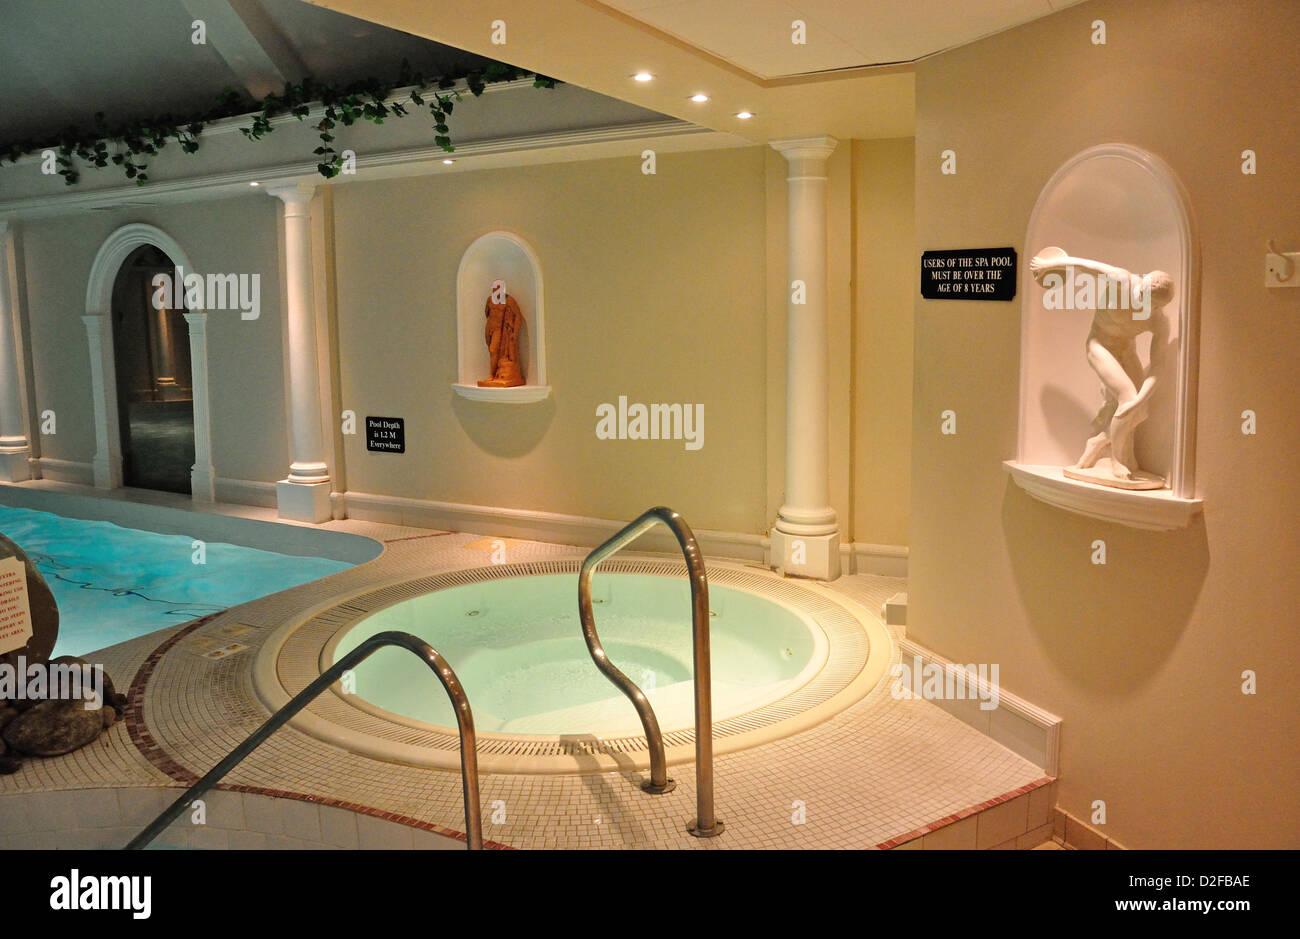 Henley Spa Hotel